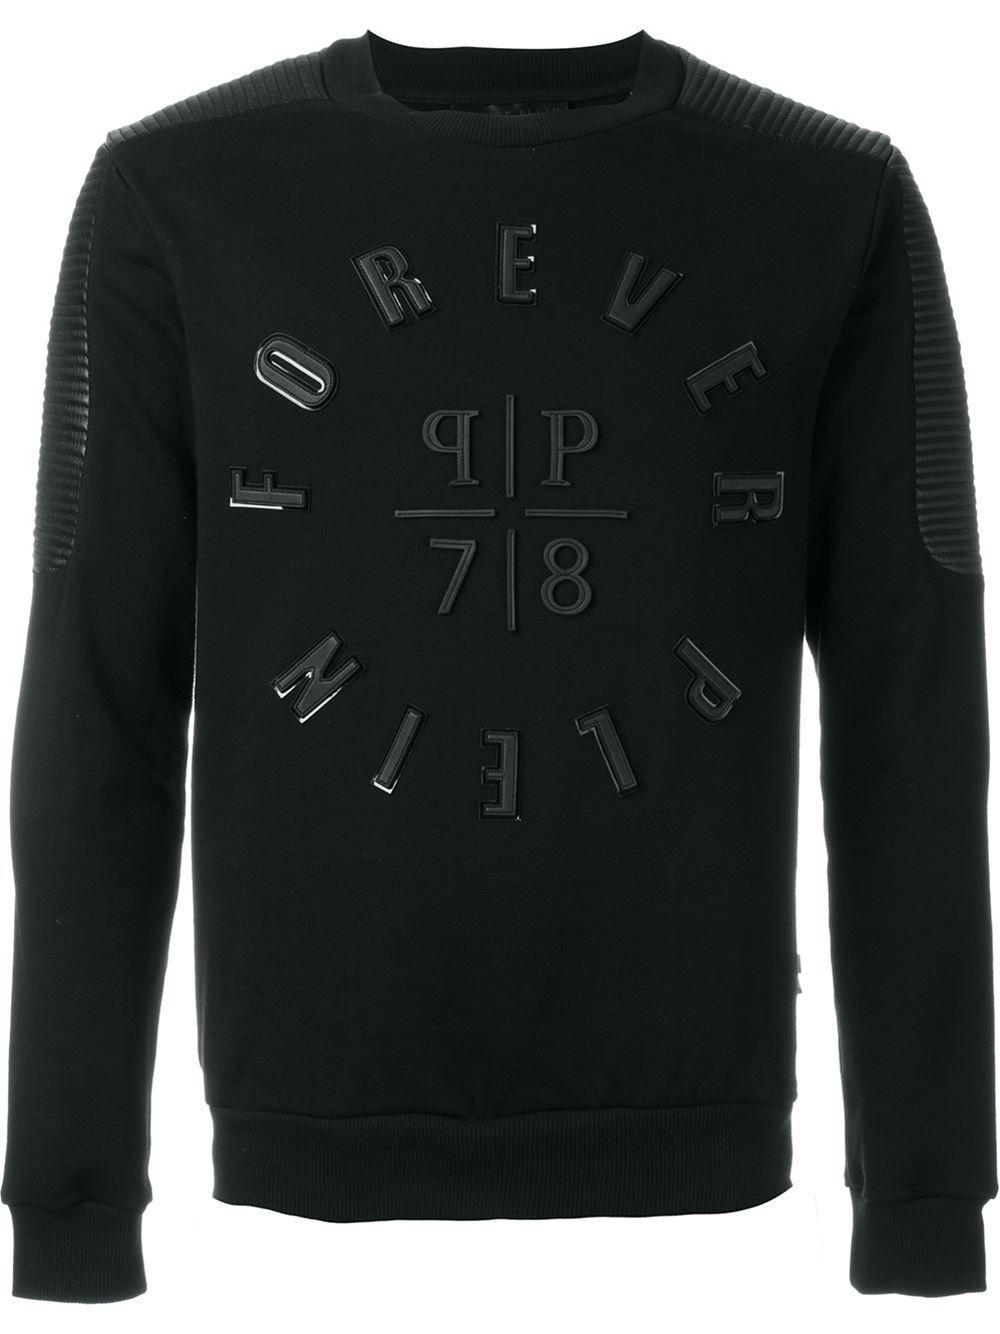 Philipp Plein  Forever  sweatshirt   NERD in 2019   Sweatshirts ... c04fb1aaee0